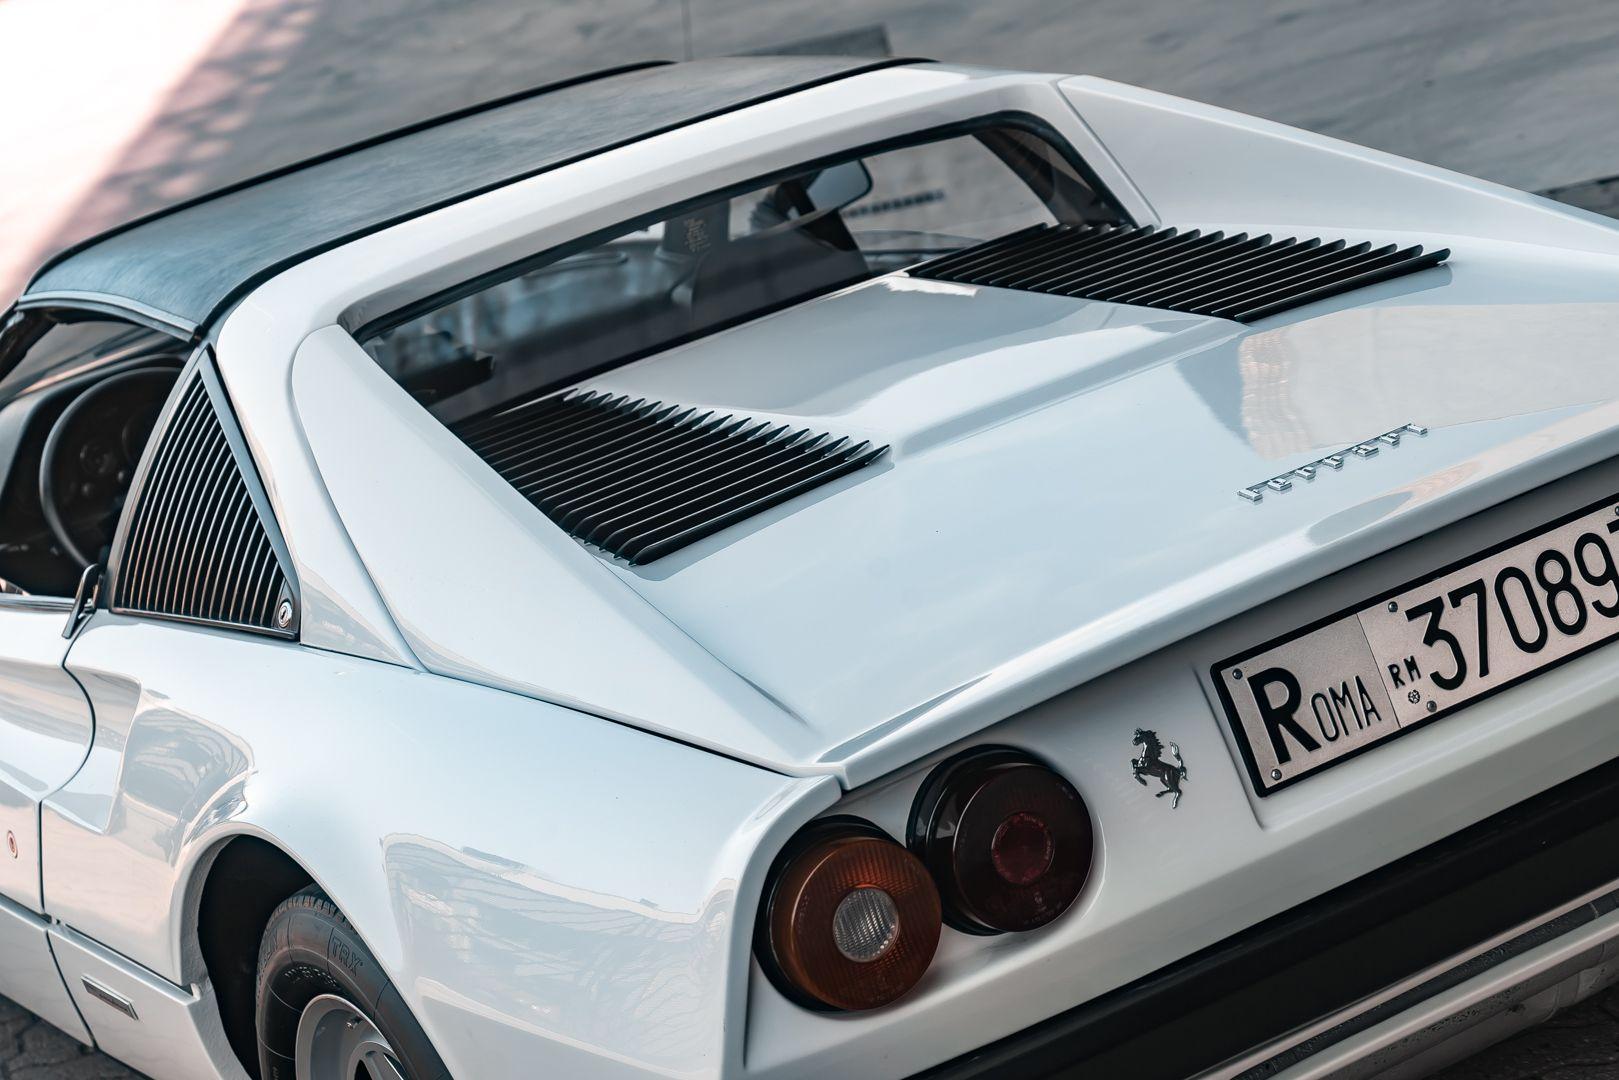 1982 Ferrari 208 GTS Carburatori 75998